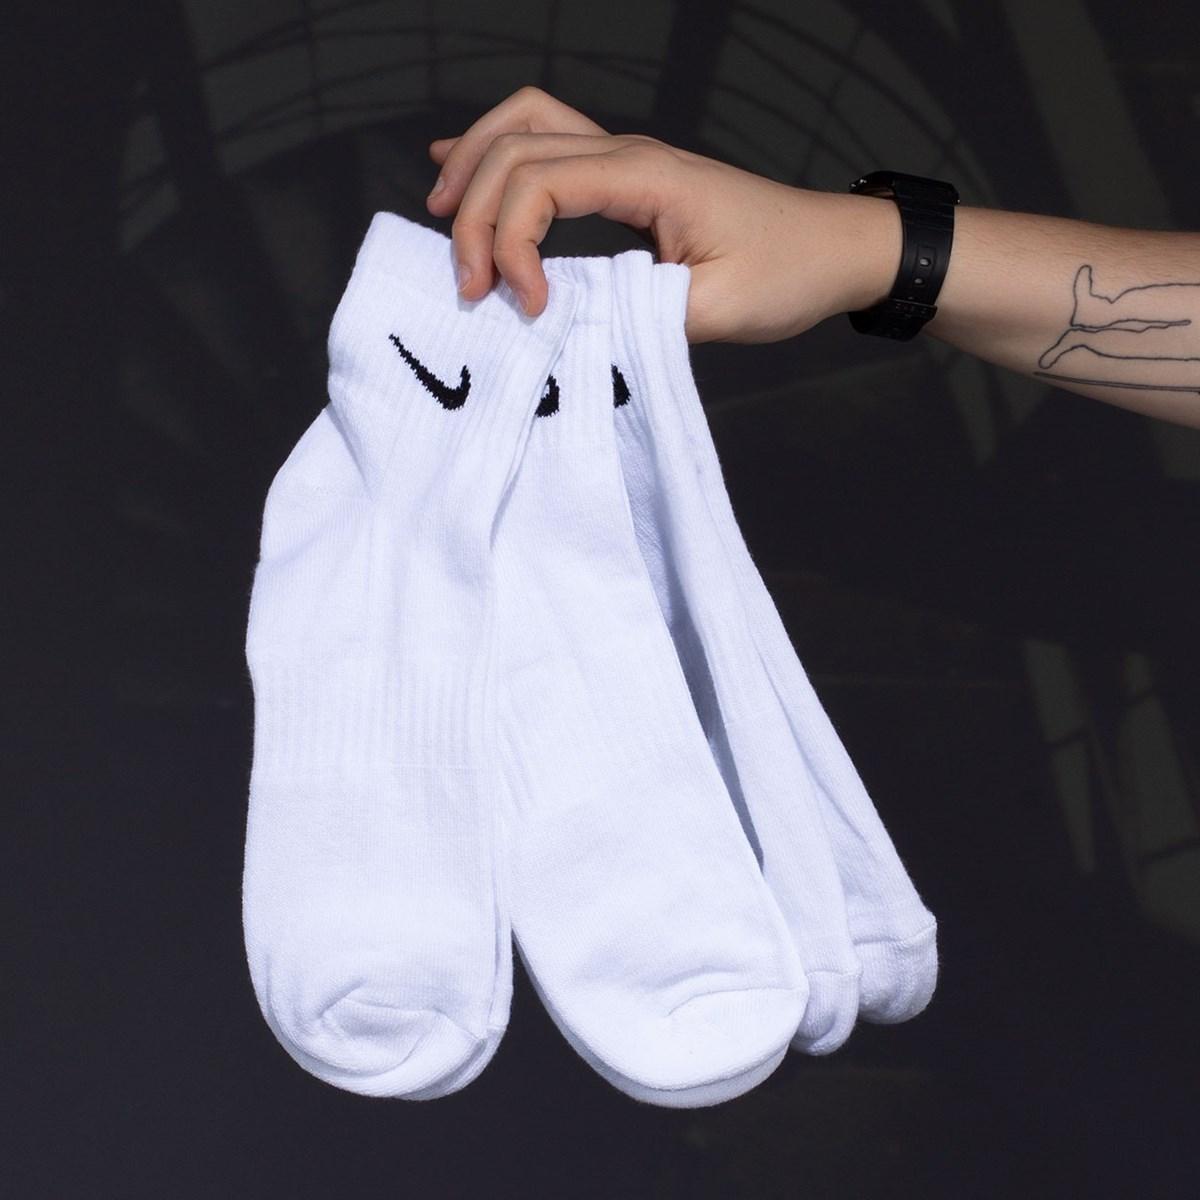 Meia Nike Masculina Everyday Cotton Cushioned Ankle Kit 3 Pares White SX7667-100